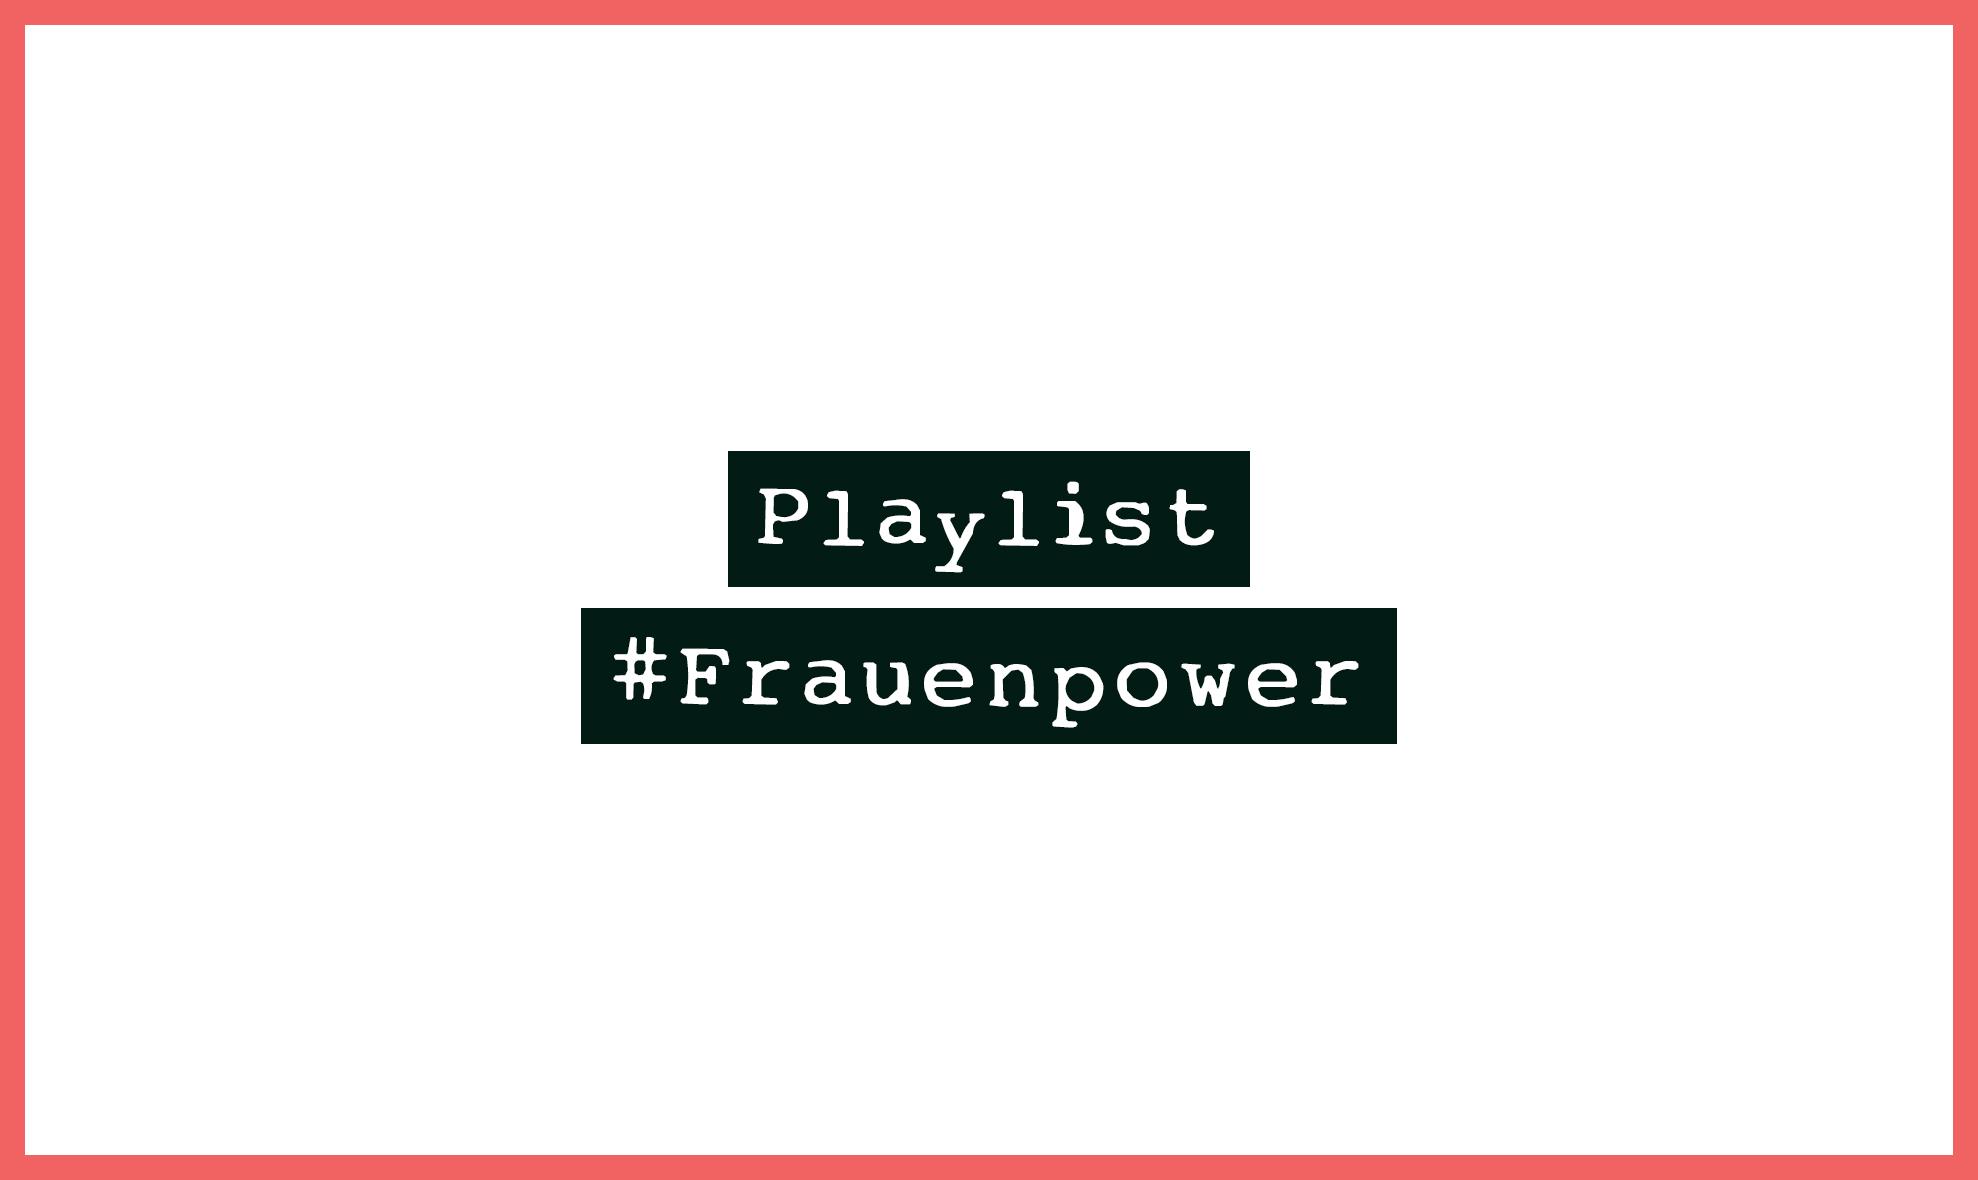 Frauenpower Playlist